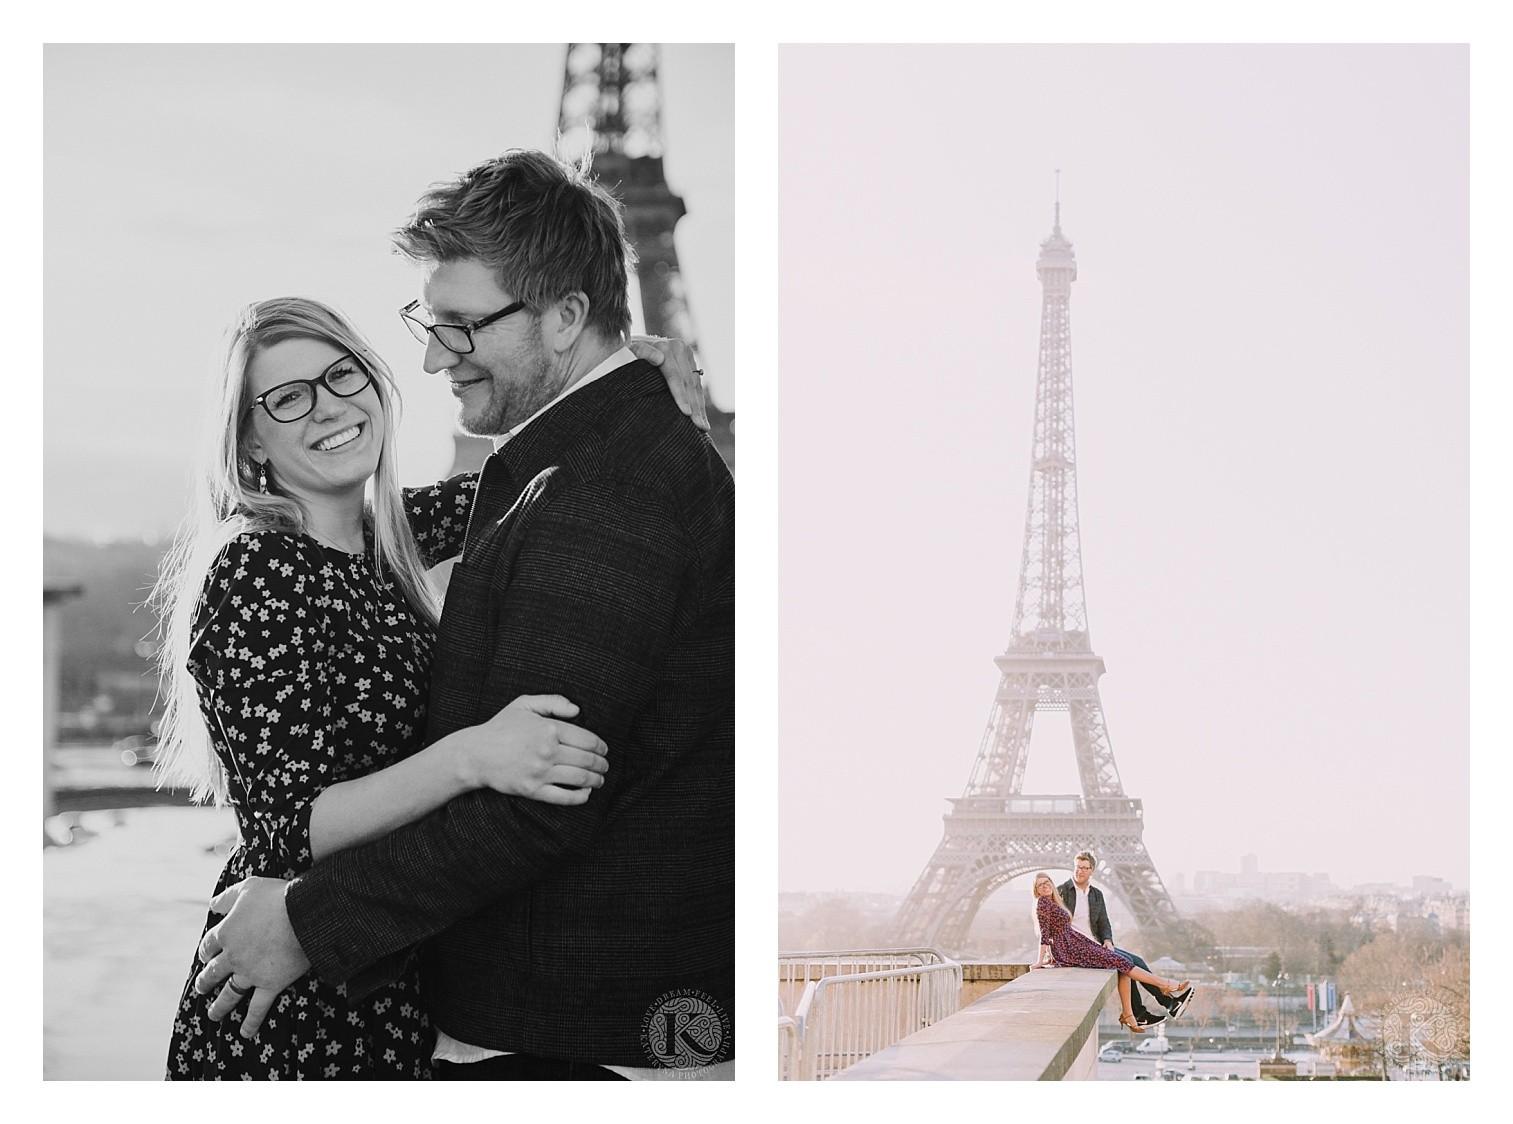 Kateryna-photos-photographe-mariage-chateau-st-paterne-mayenne-normandie_0218.jpg